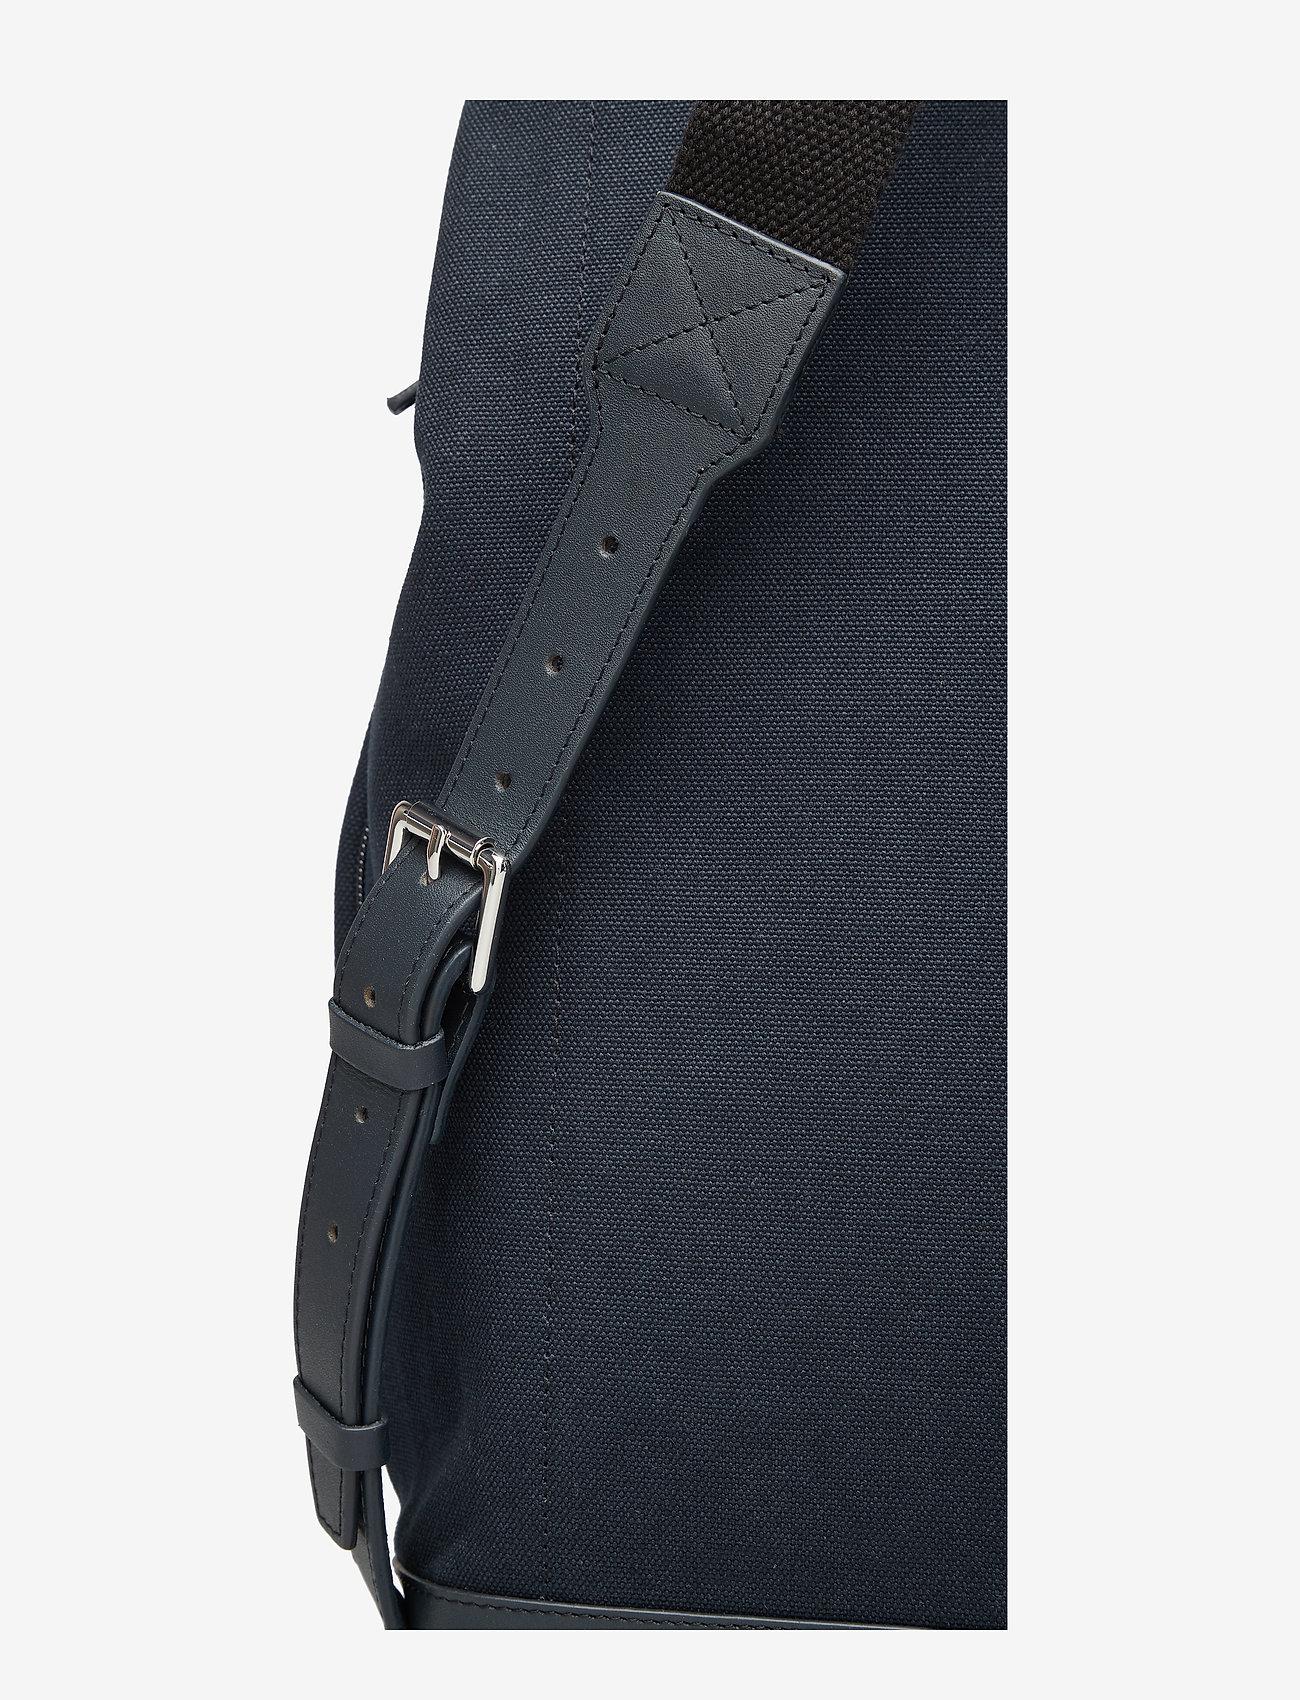 Sandqvist Hege - Sac Á Dos Navy With Leather